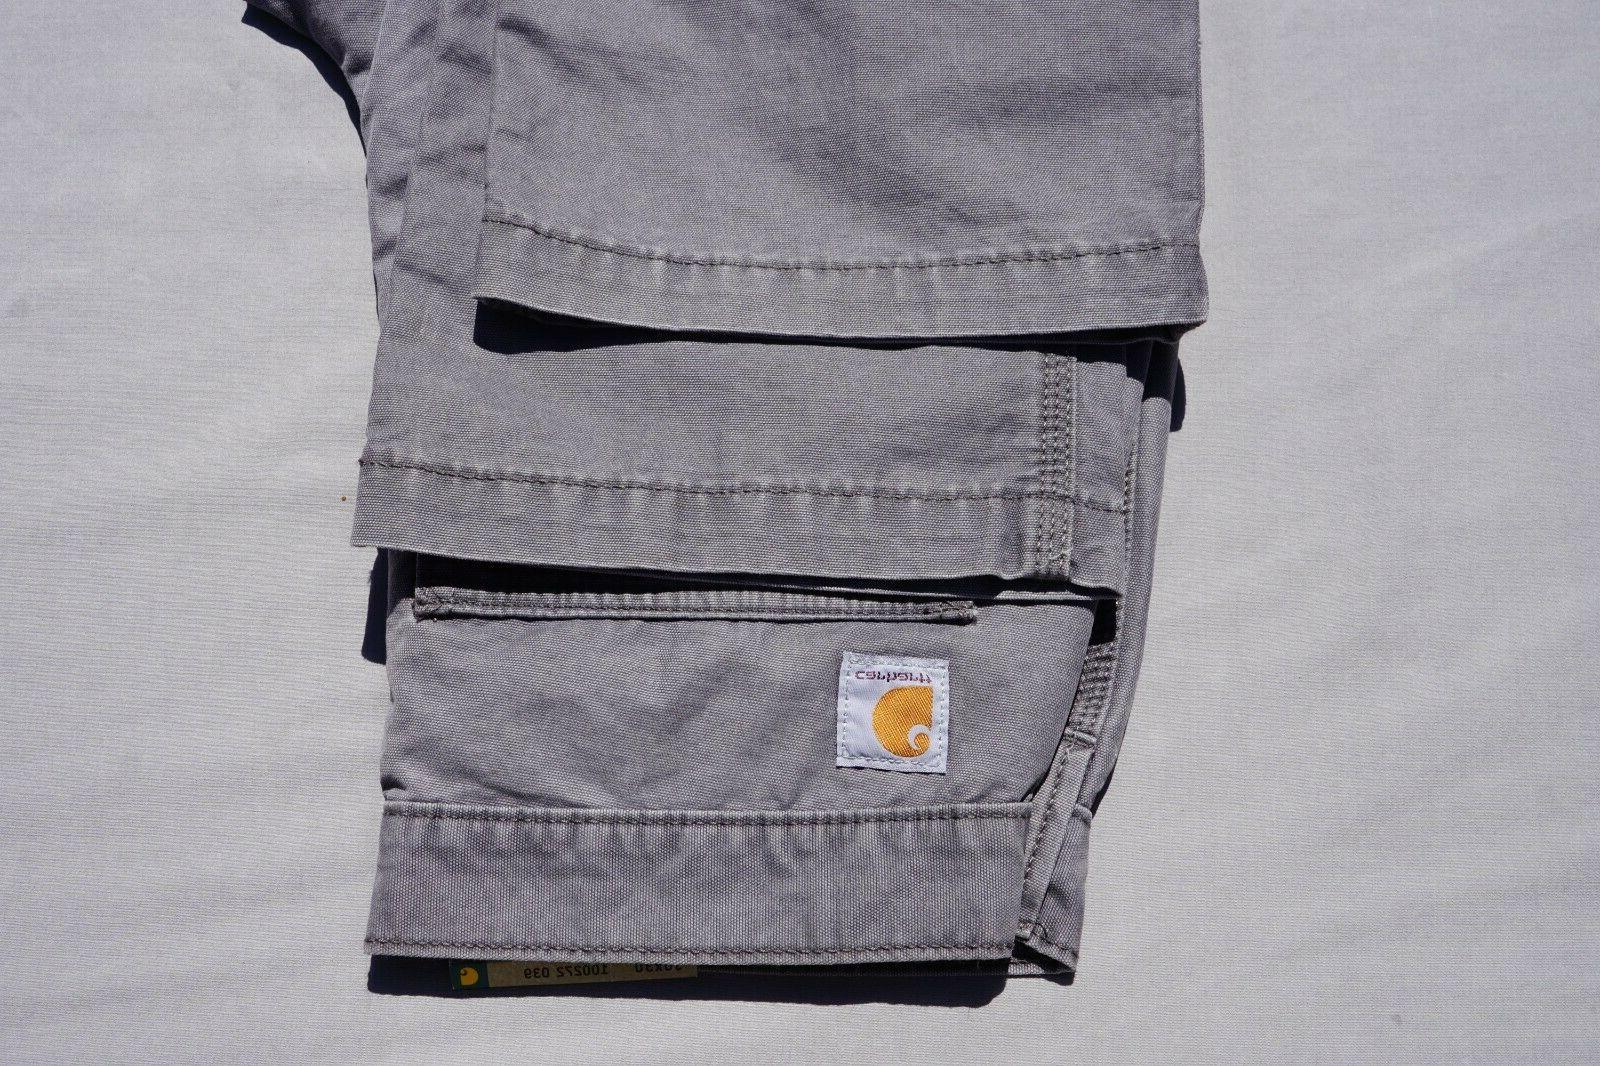 Carhartt Cotton Canvas Cargo Pant'. Gray, Men's 30X30. $39.99!